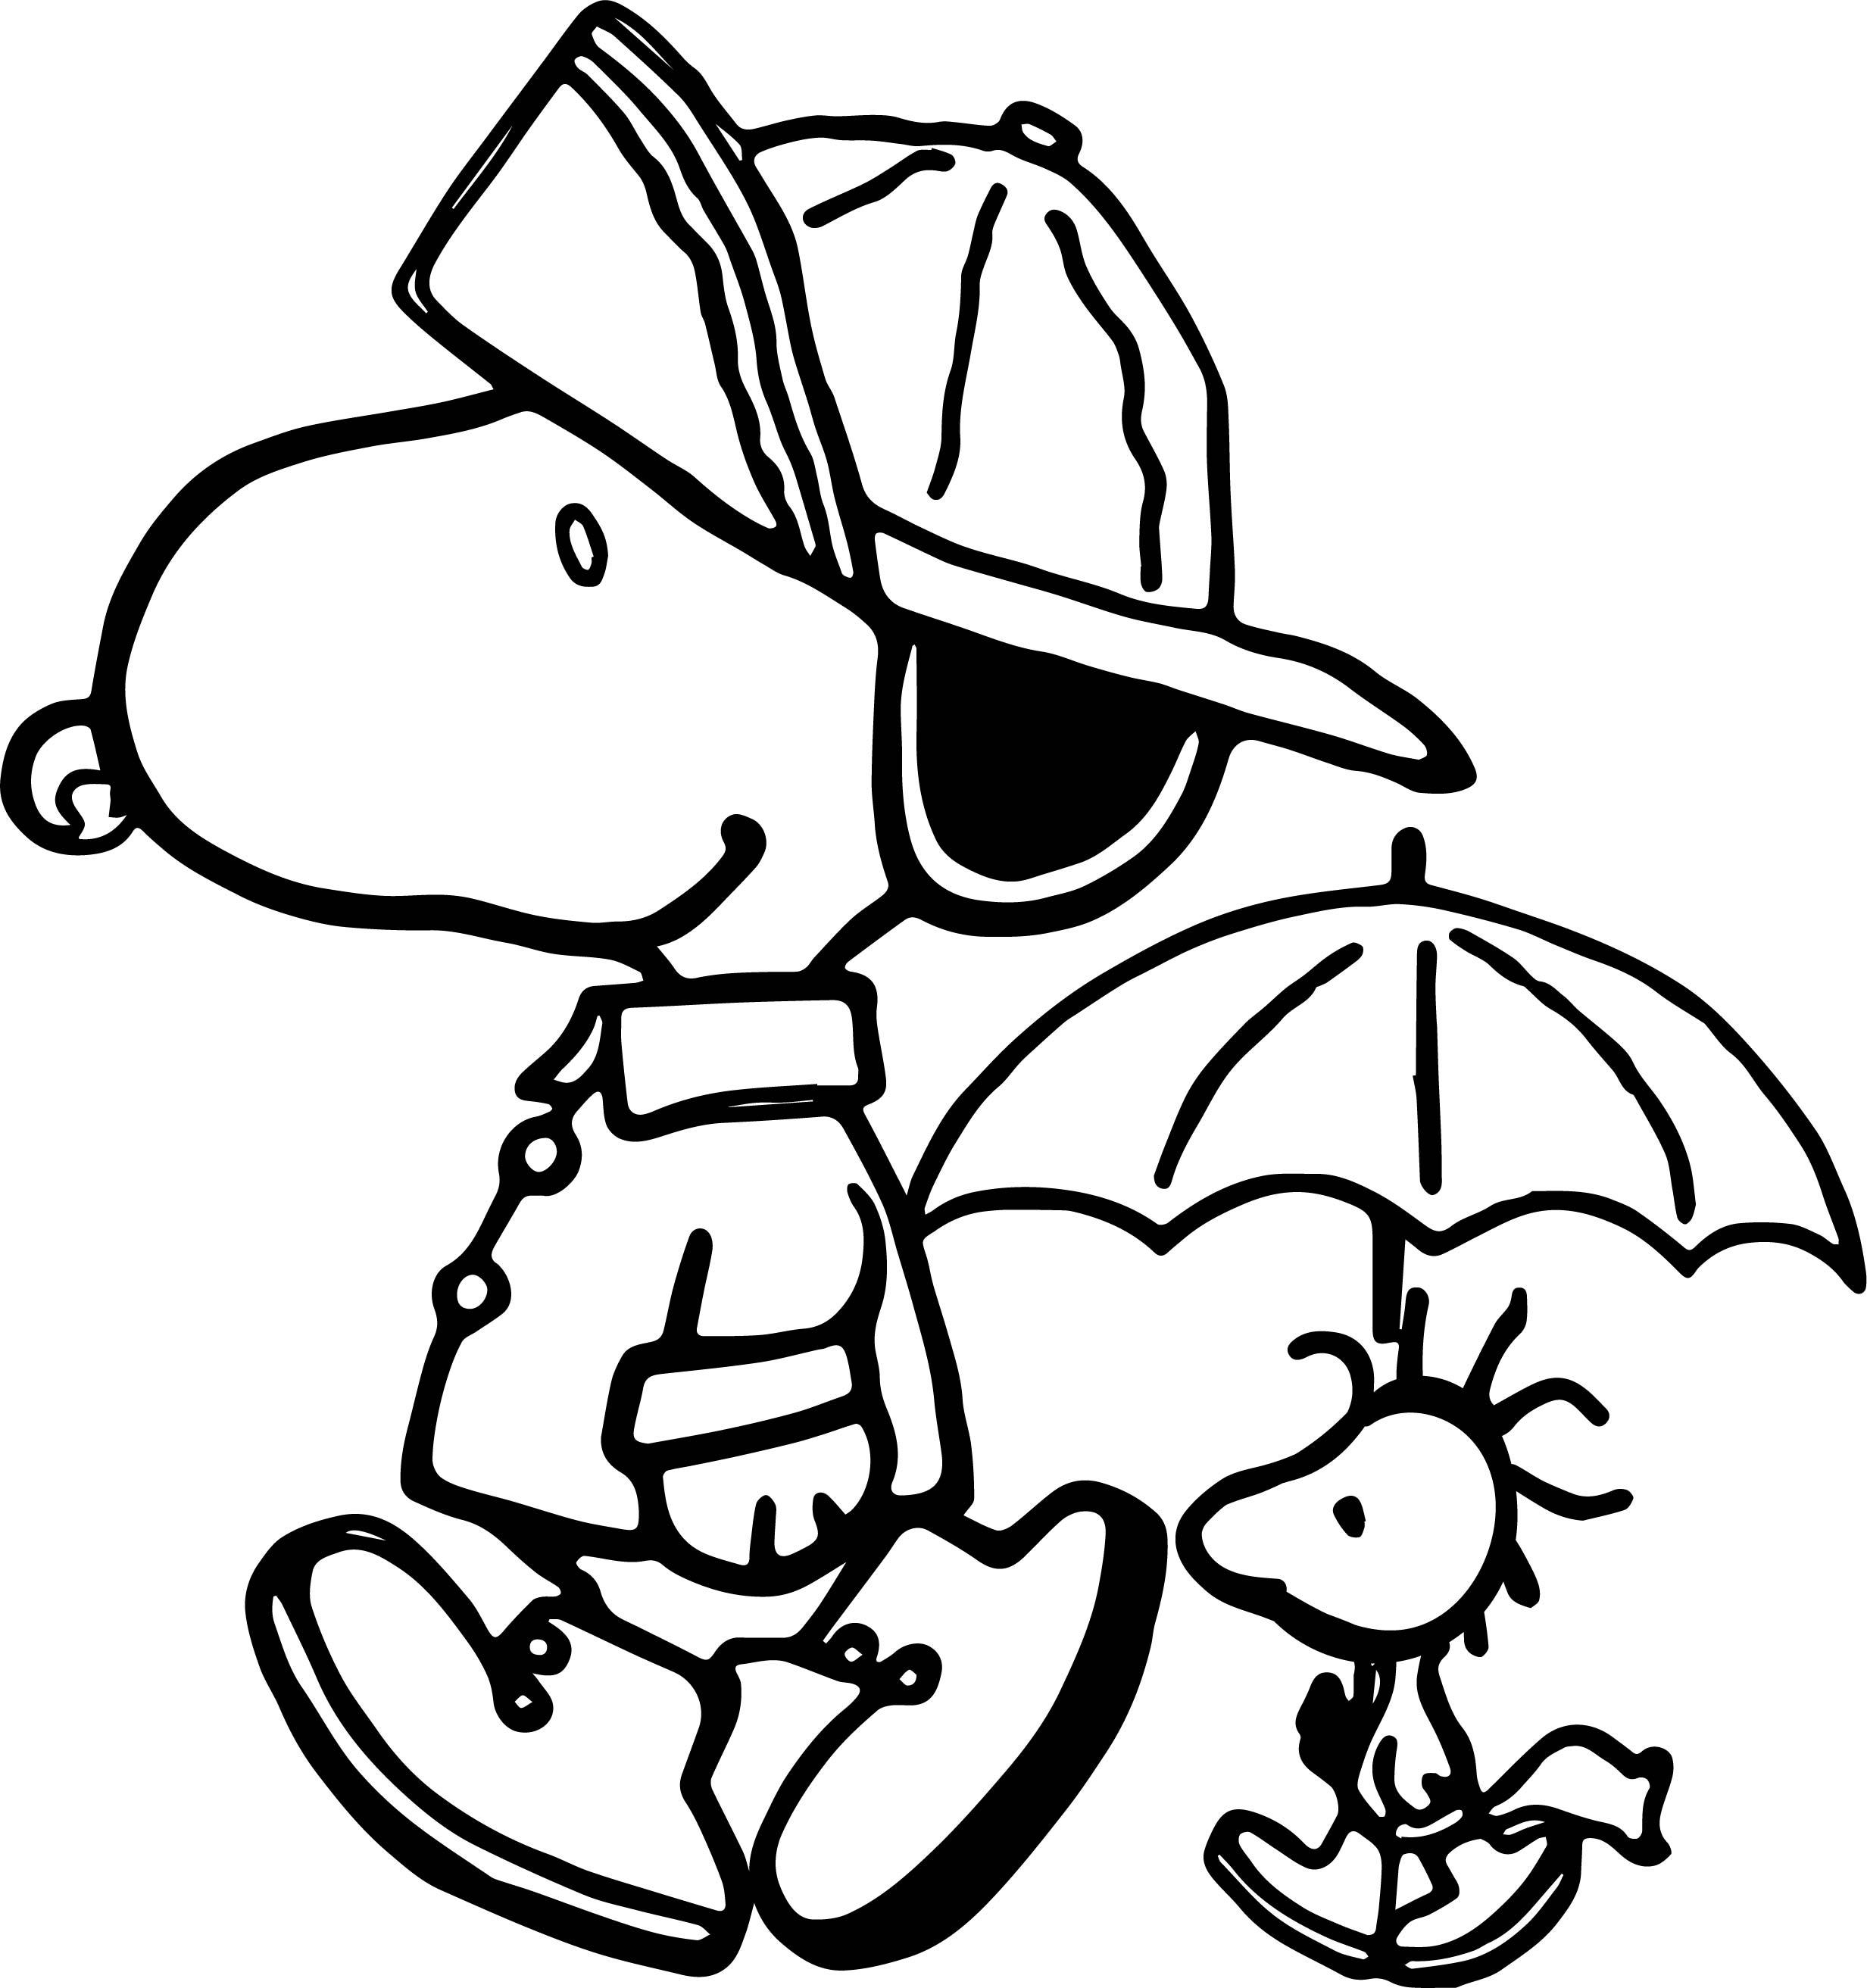 Peanuts Snoopy Rain Gear Coloring Page | Wecoloringpage